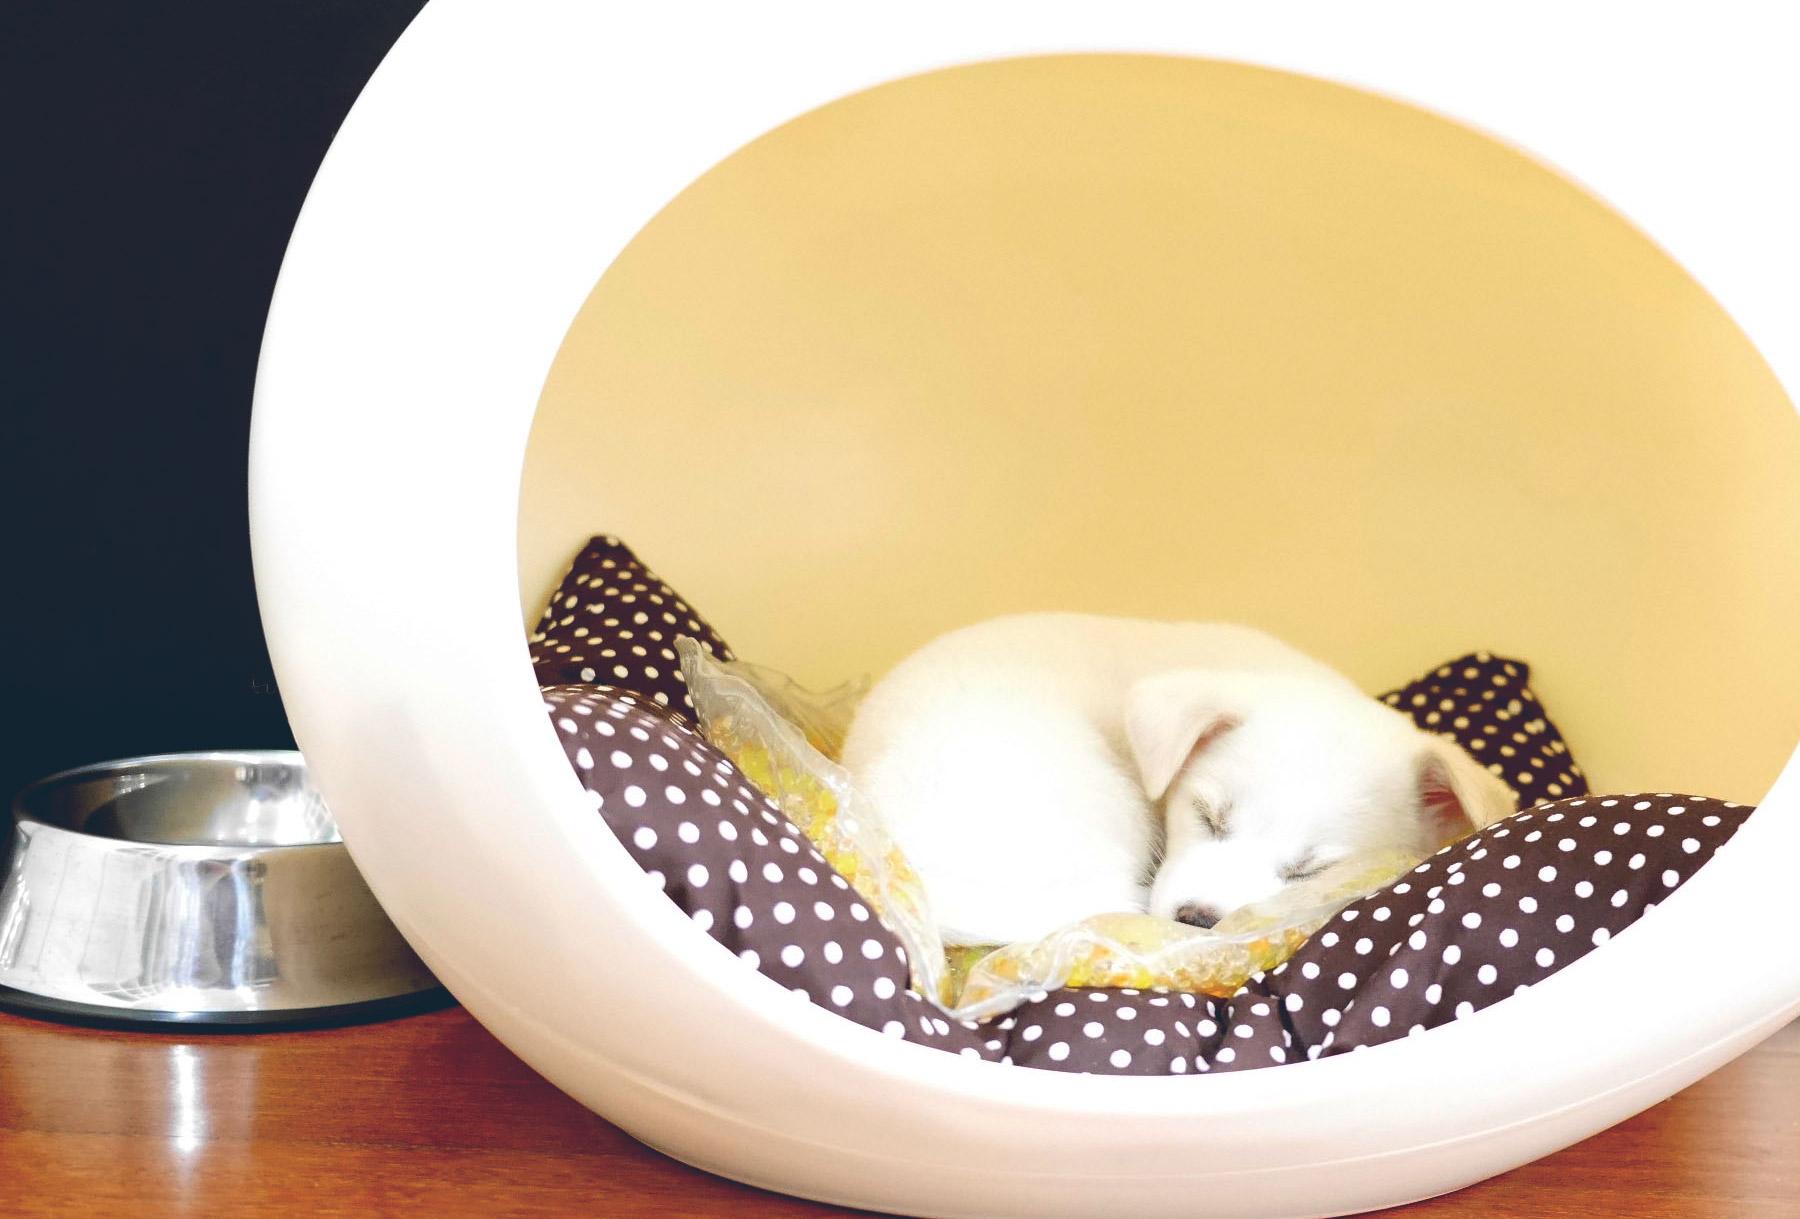 pet-egg-house-logo-design-02